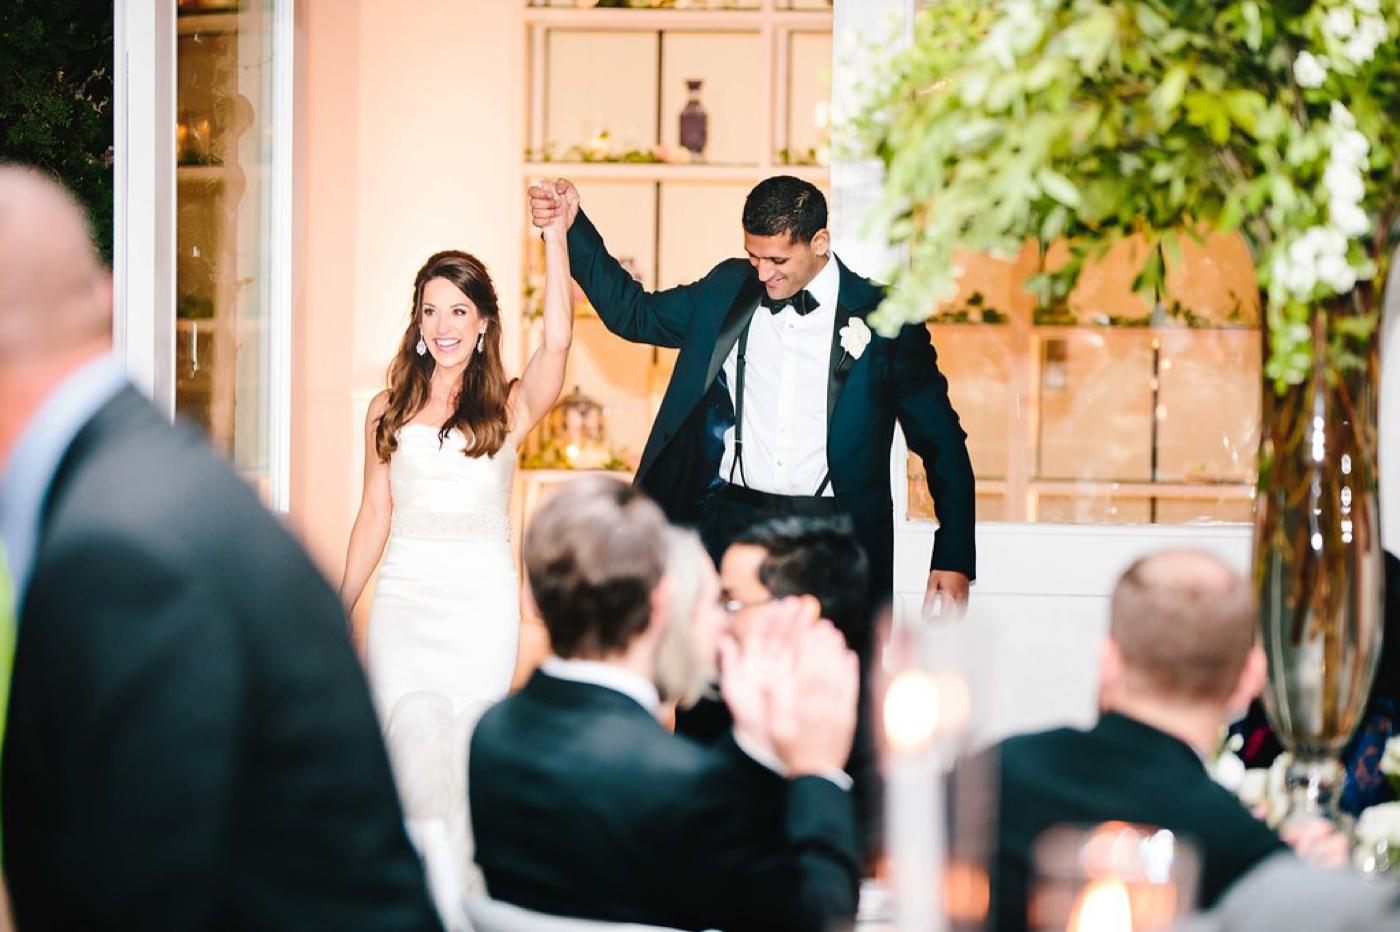 chicago-fine-art-wedding-photography-sakamuri78